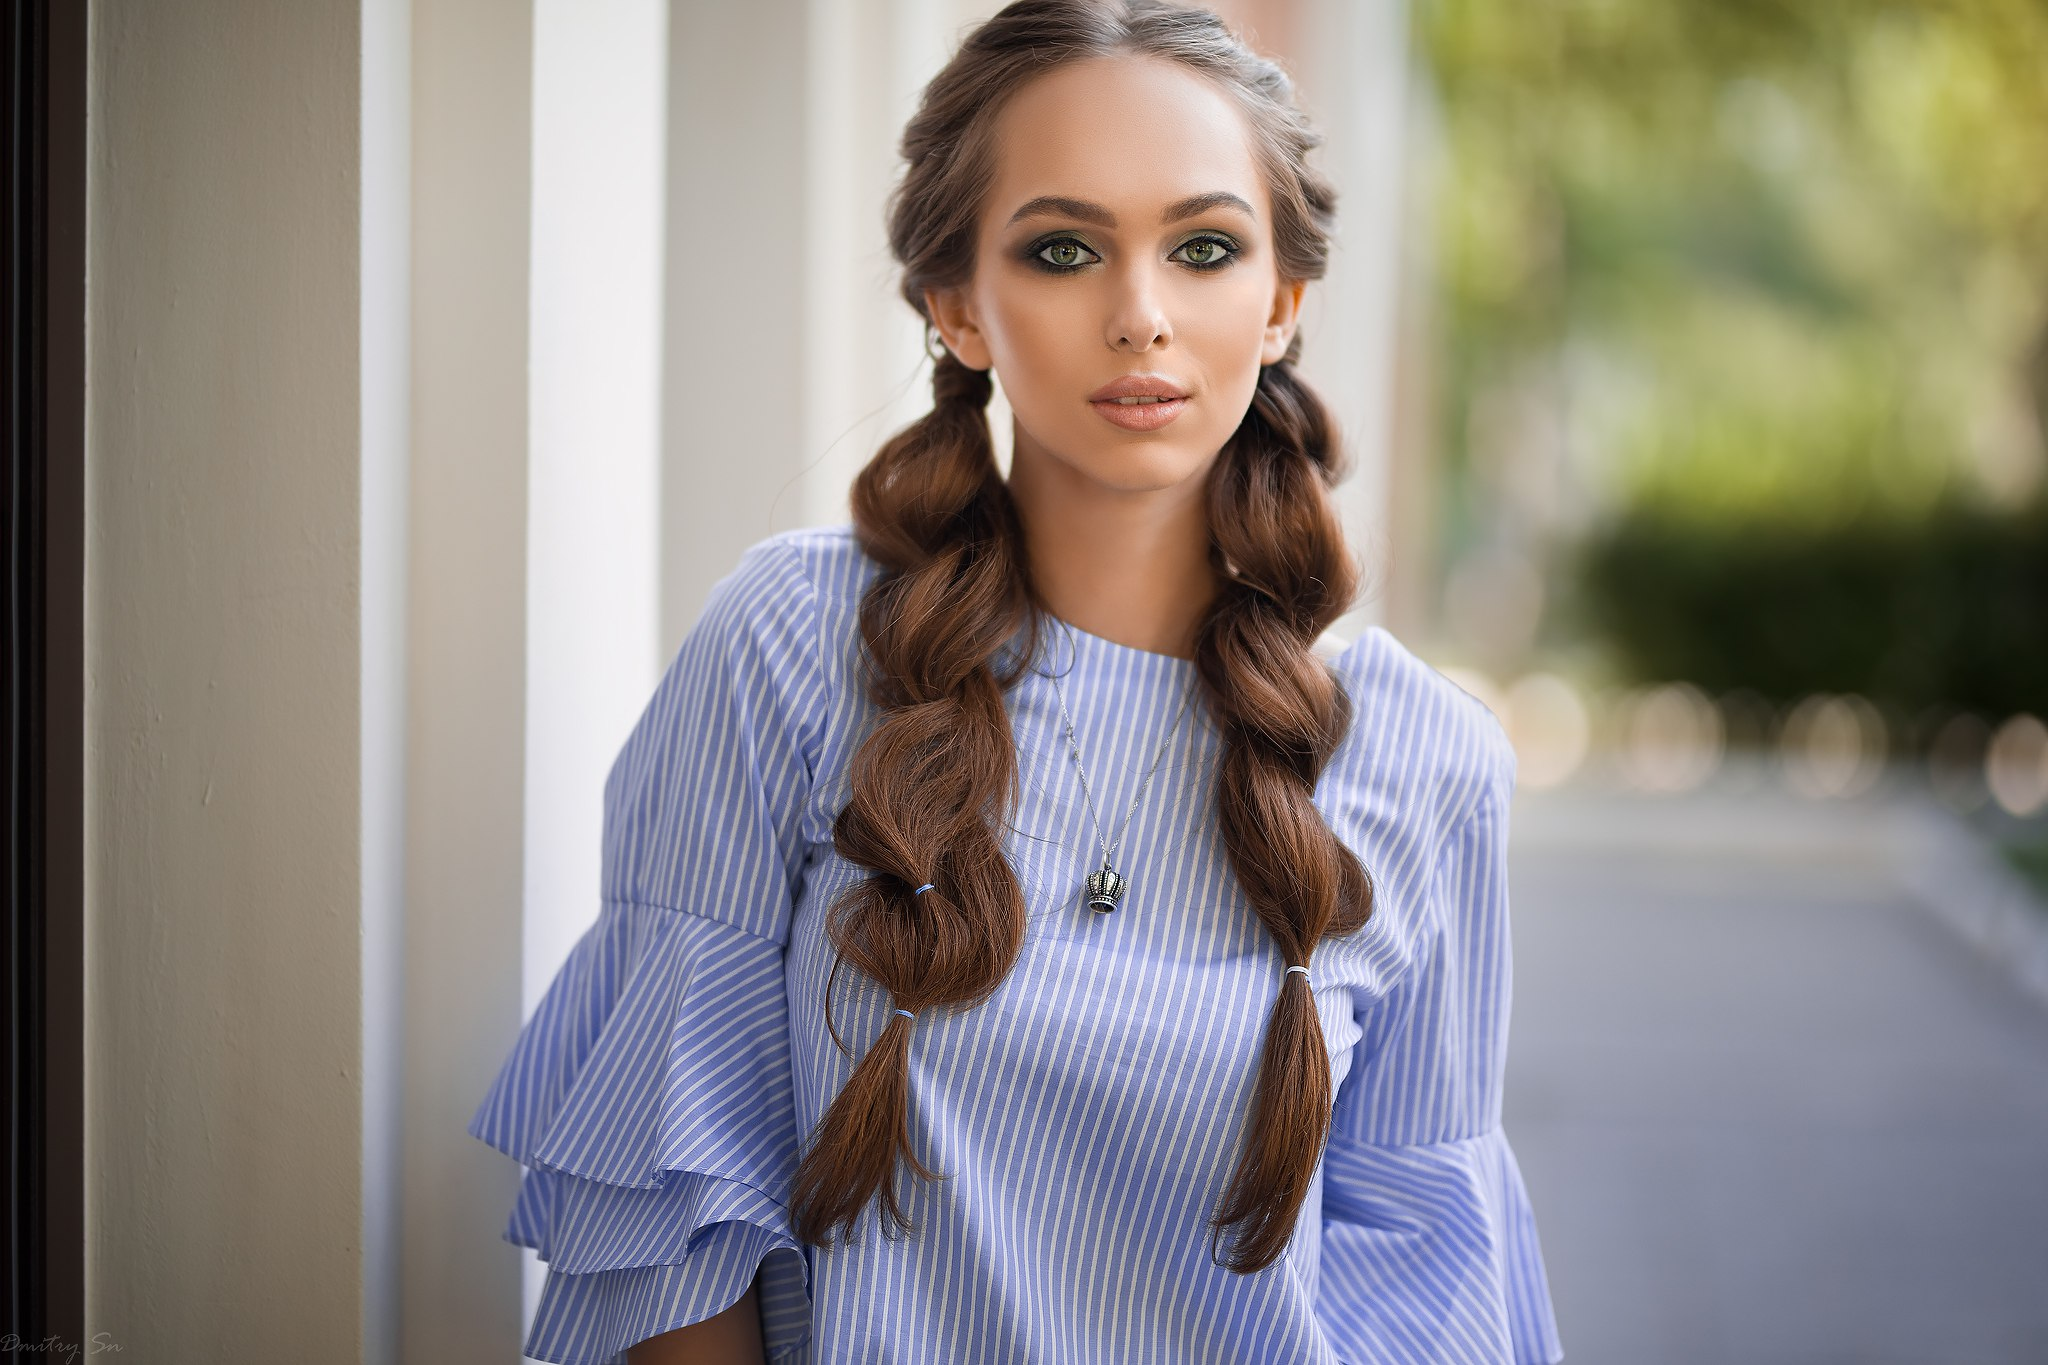 Long Hair Depth Of Field Brunette Braid Green Eyes 2048x1365